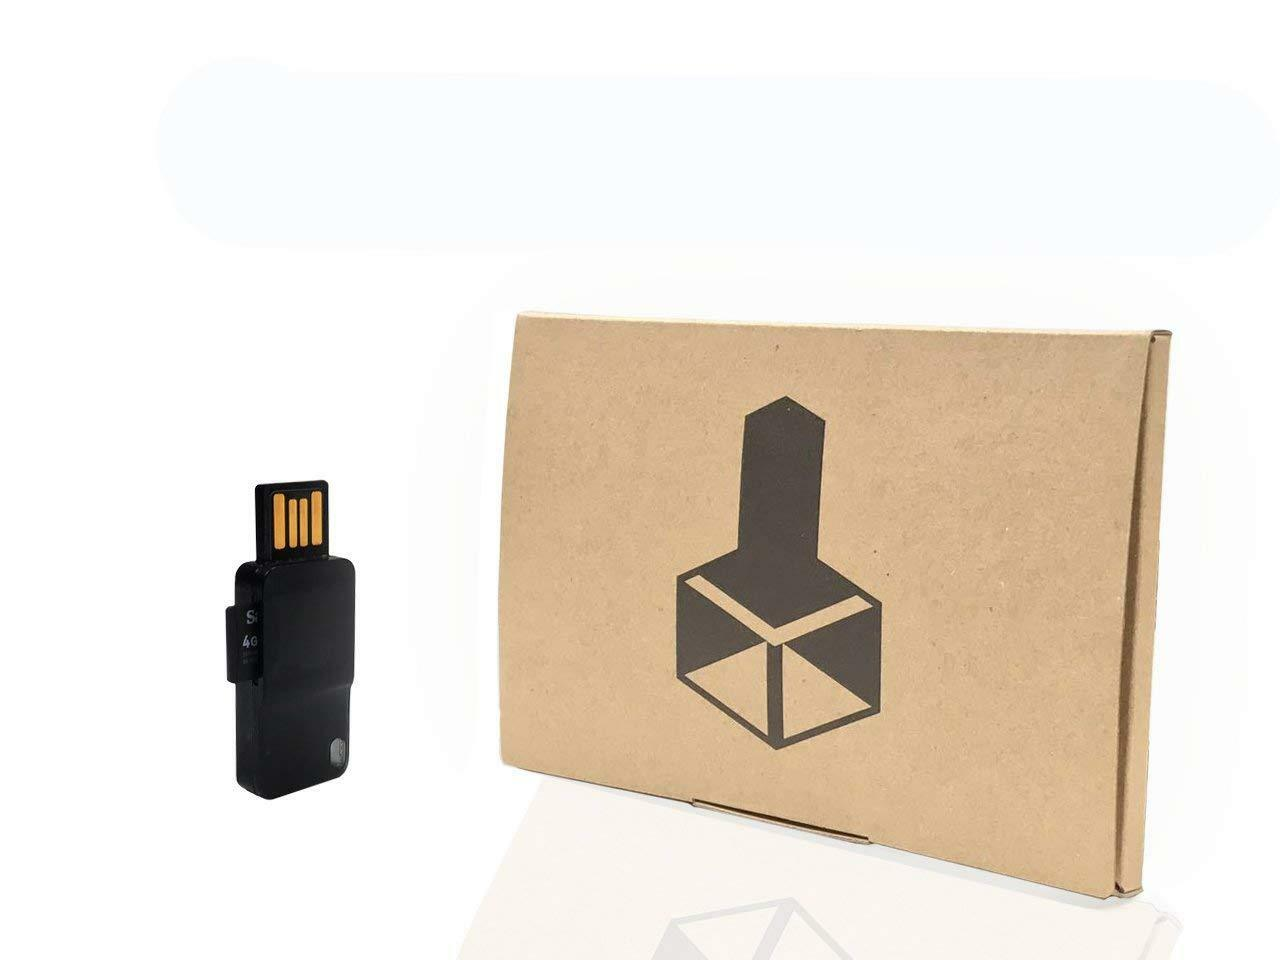 Digital Bitbox DBB1707 Cryptocurrency Bitcoin Hardware Wallet